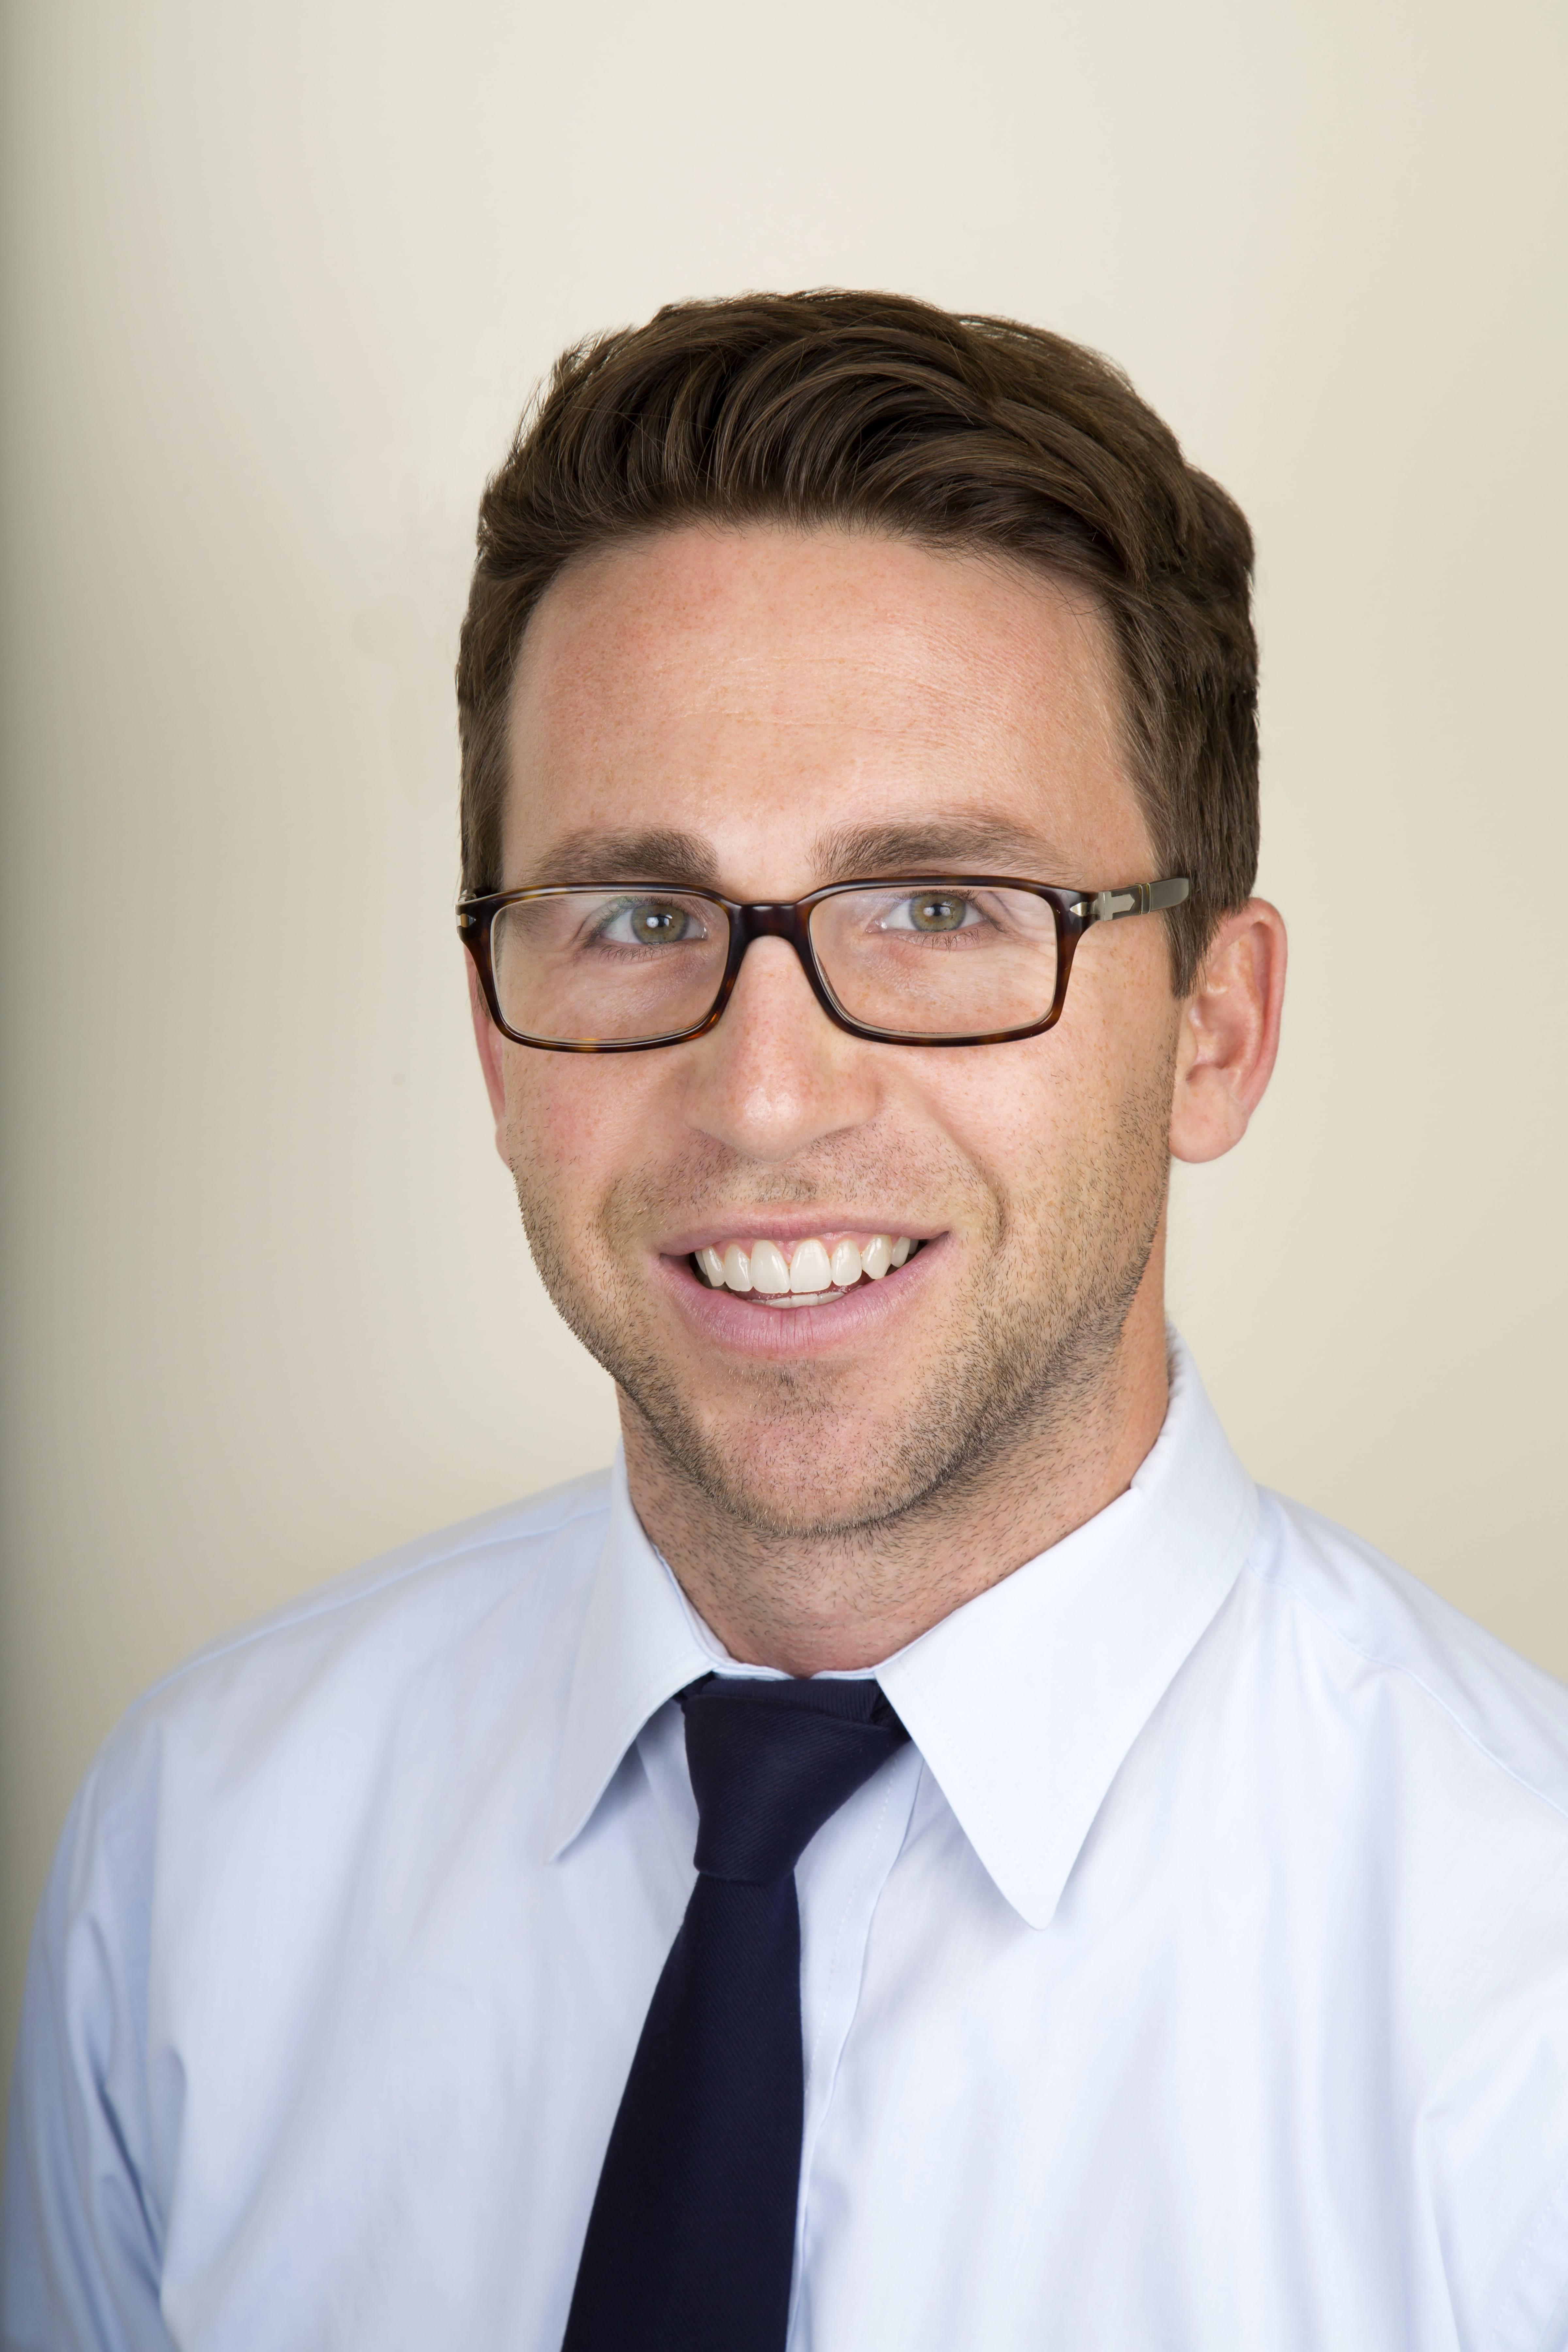 Jeremy Whyman, MD's avatar